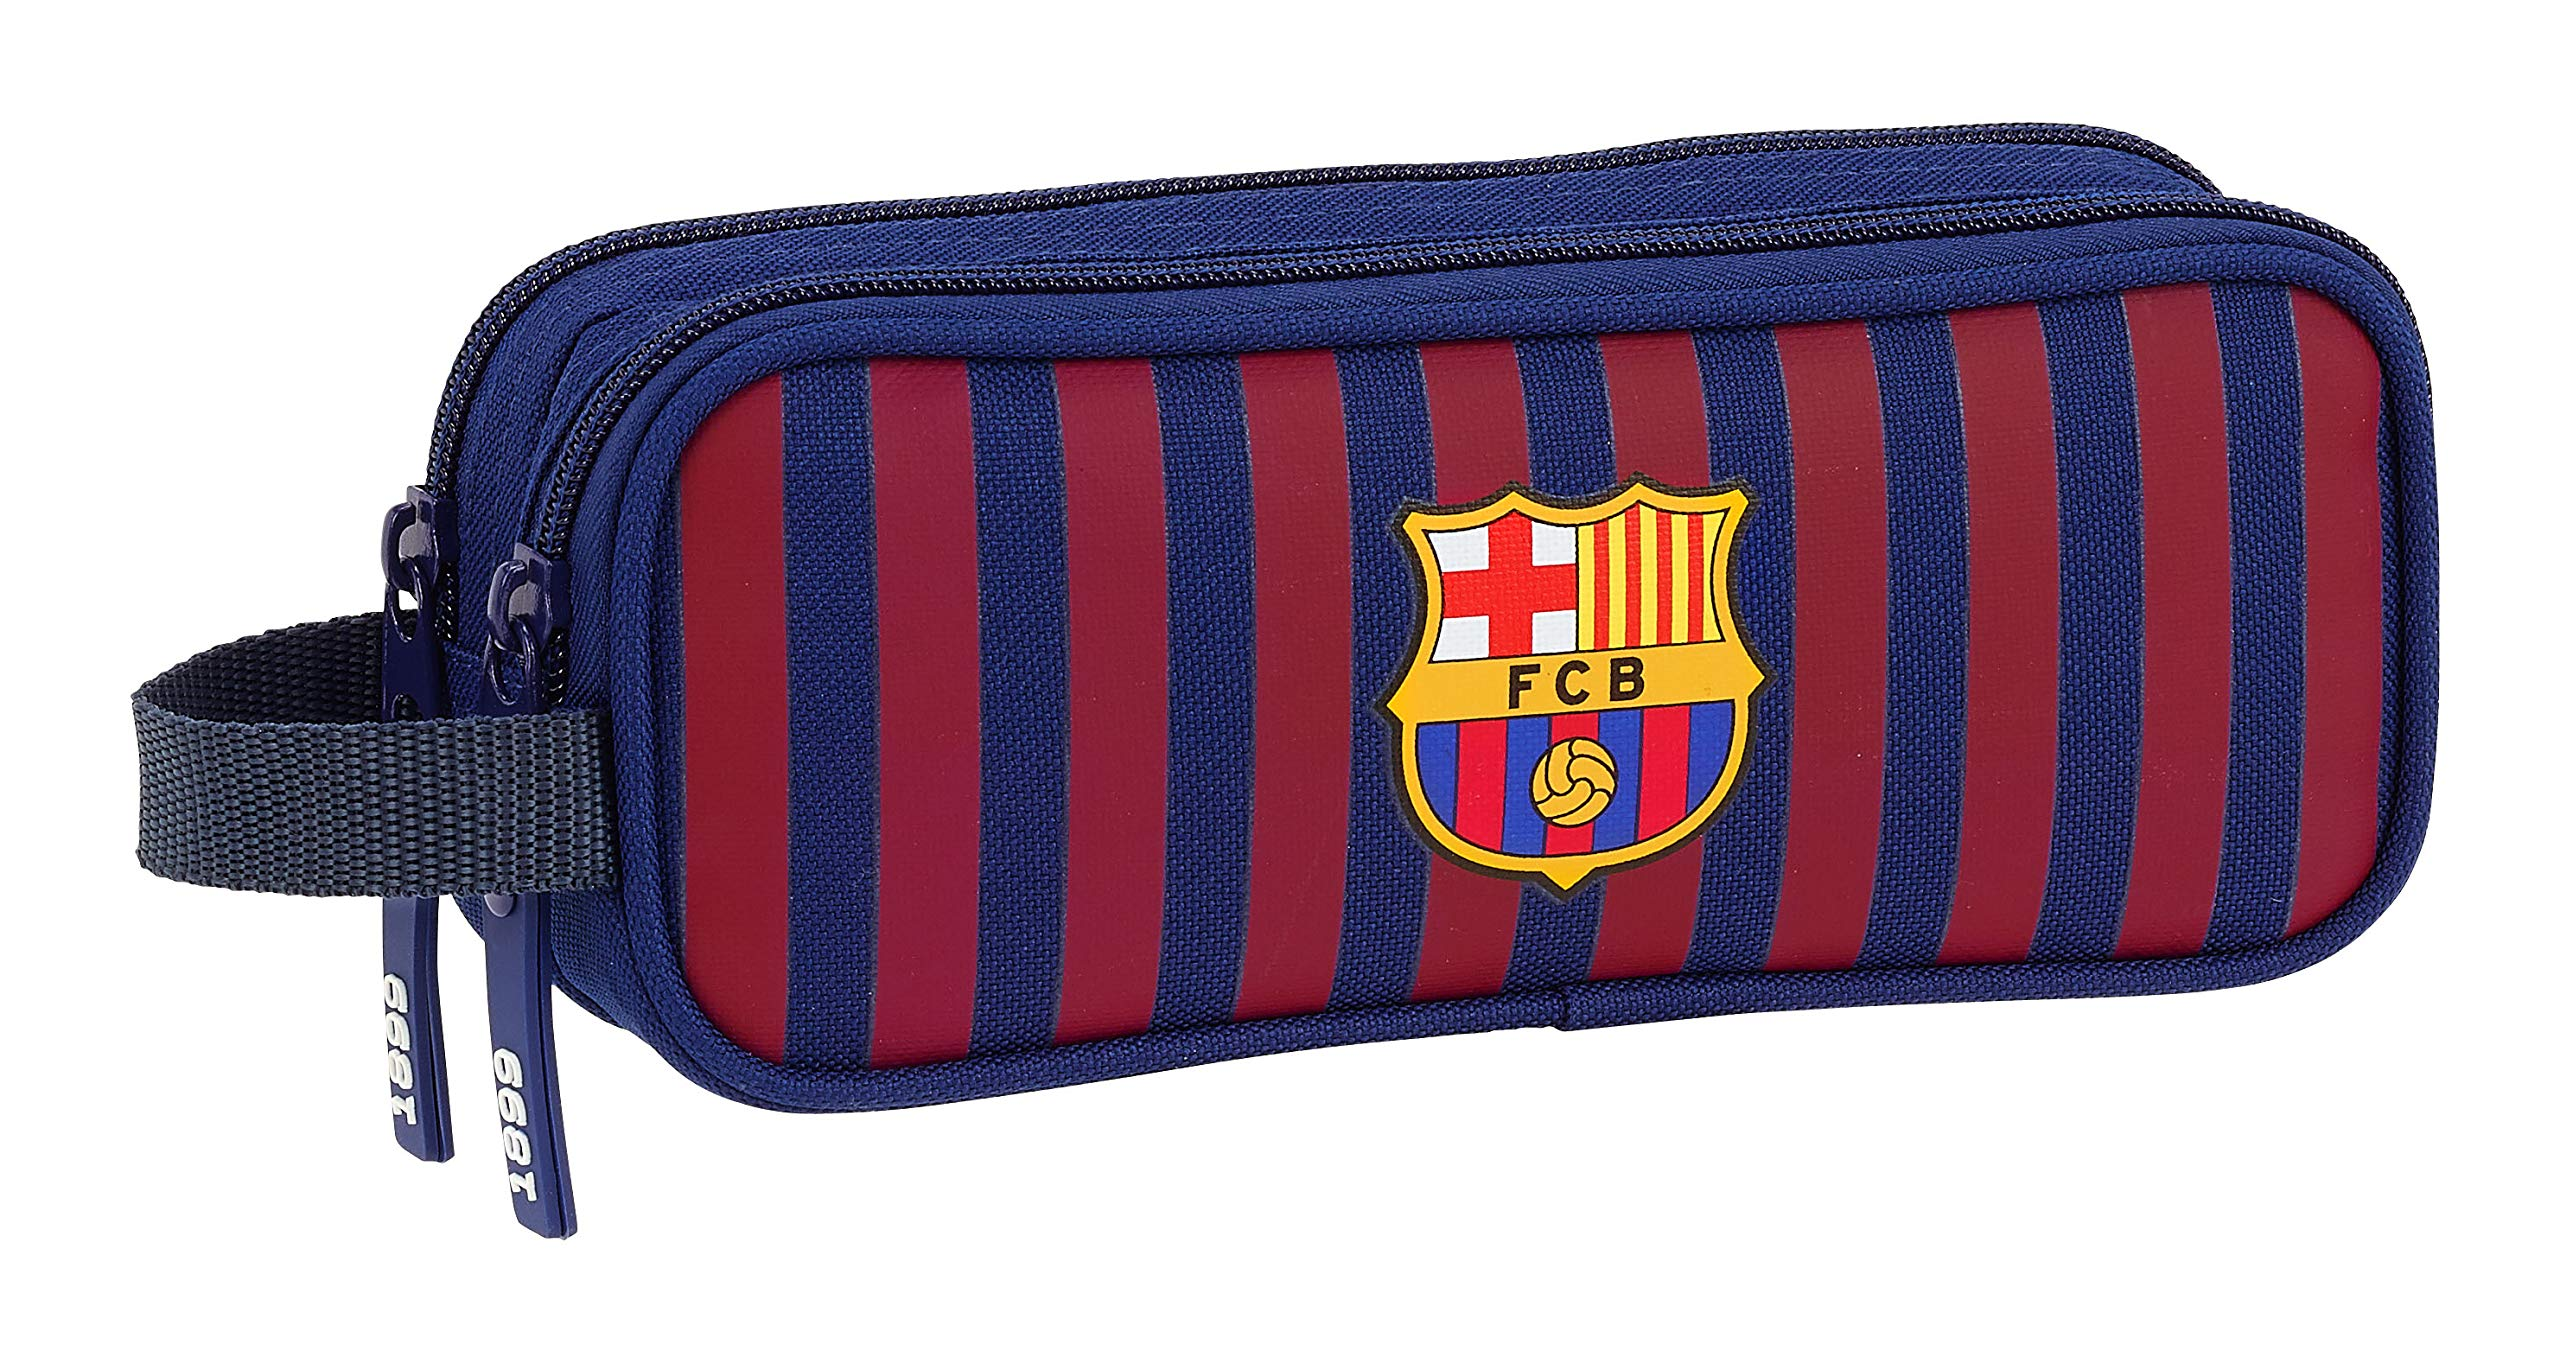 FC Barcelona 811829513 2018 Estuches, 21 cm, Azul